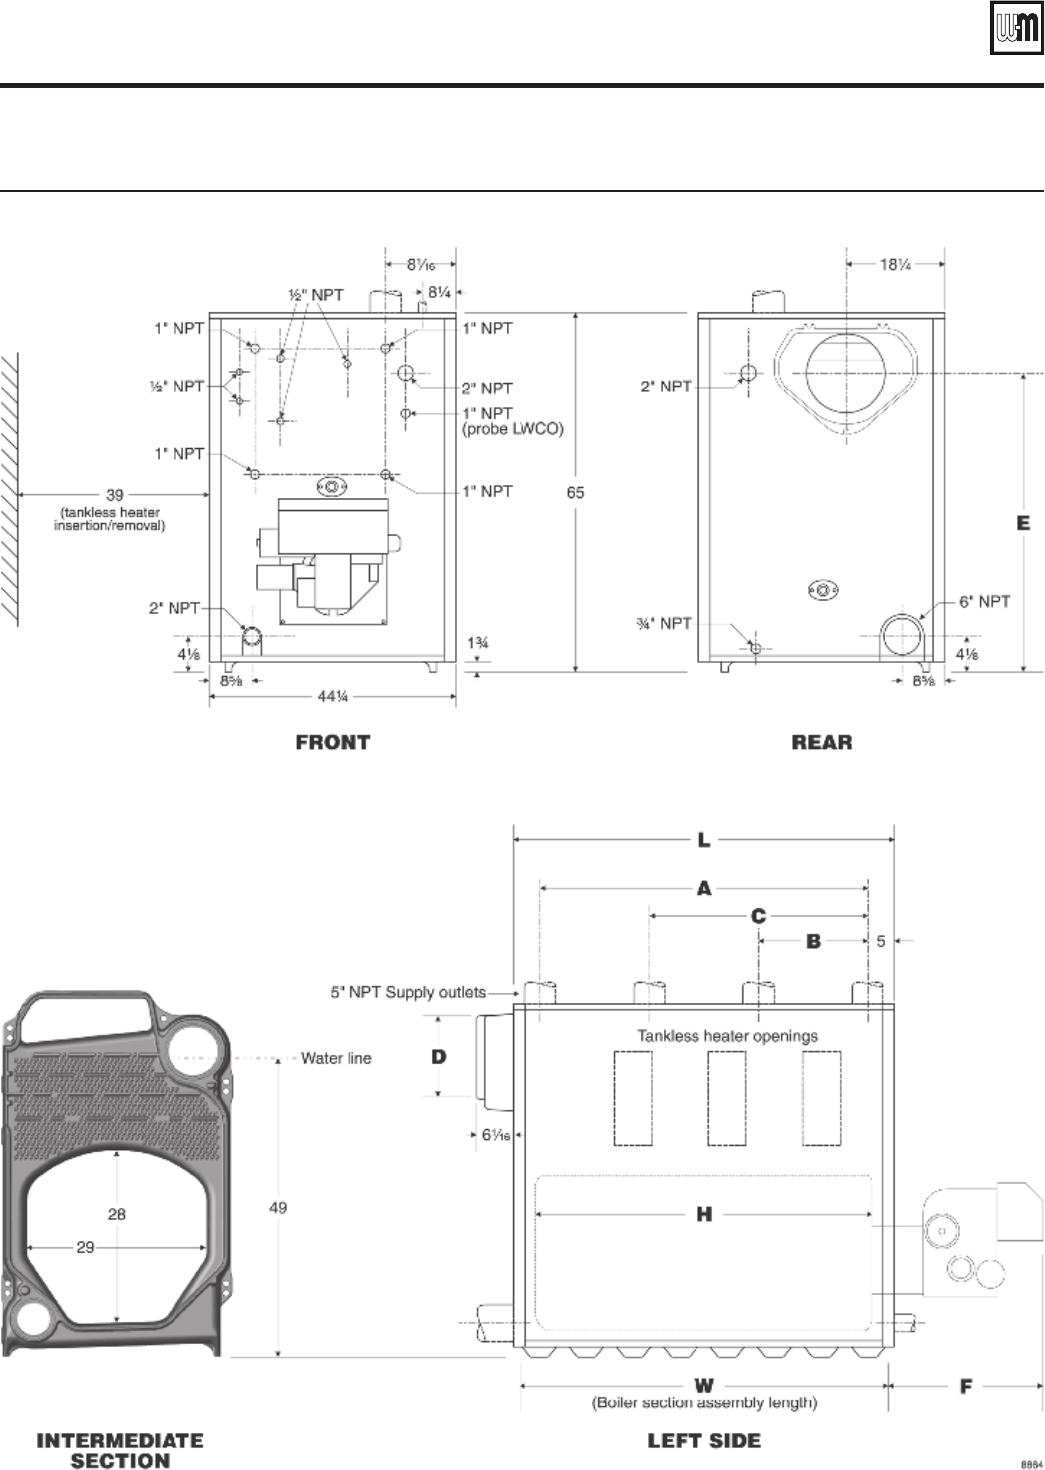 Weil Mclain 88 Users Manual Boiler Schematic Diagram Installation Start Up Maintenance Parts